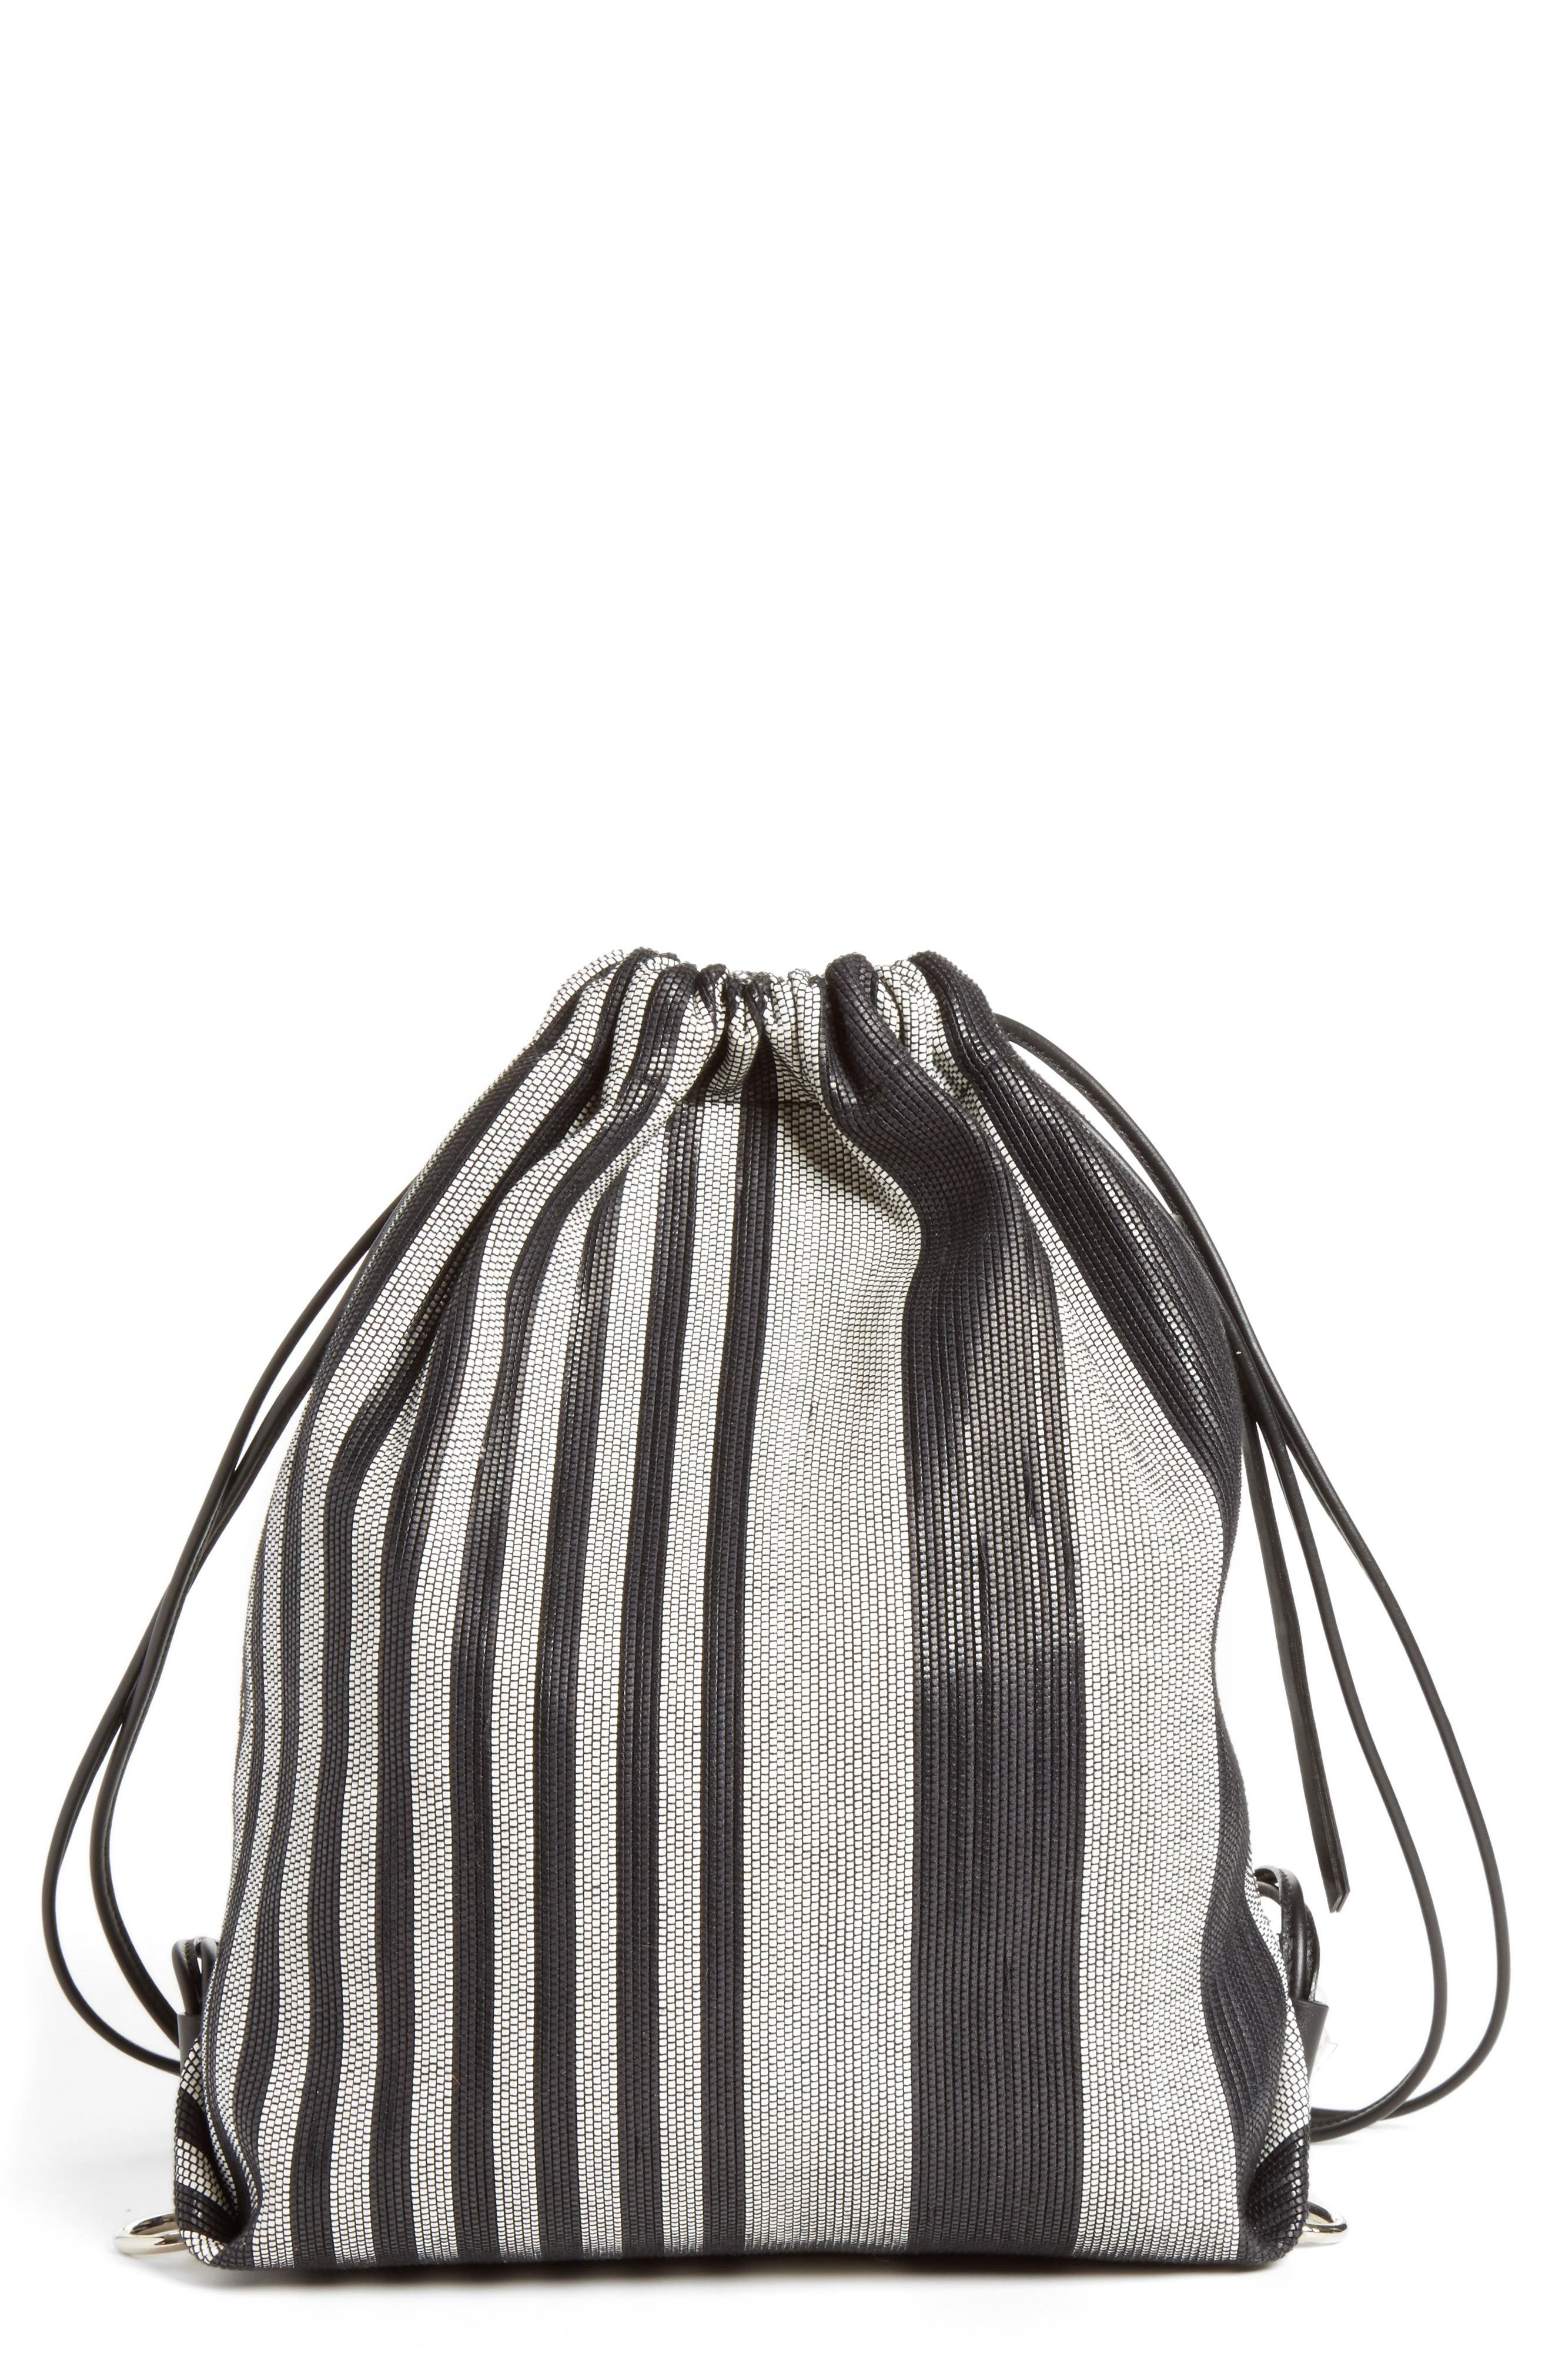 Alternate Image 1 Selected - Proenza Schouler Drawstring Backpack